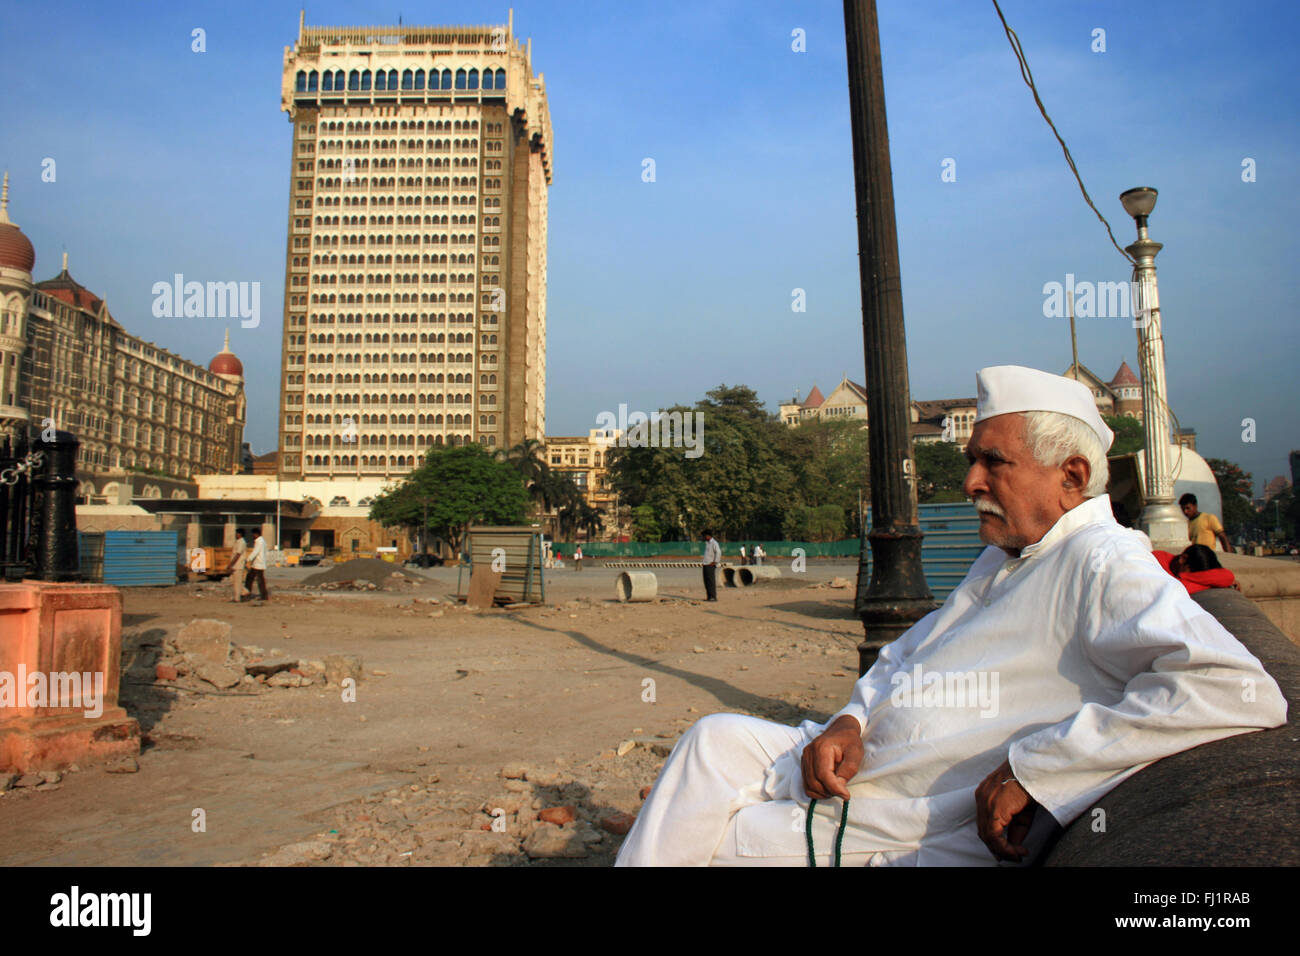 Man in front of Taj Mahal palace Hotel, Colaba, Mumbai, India - Stock Image